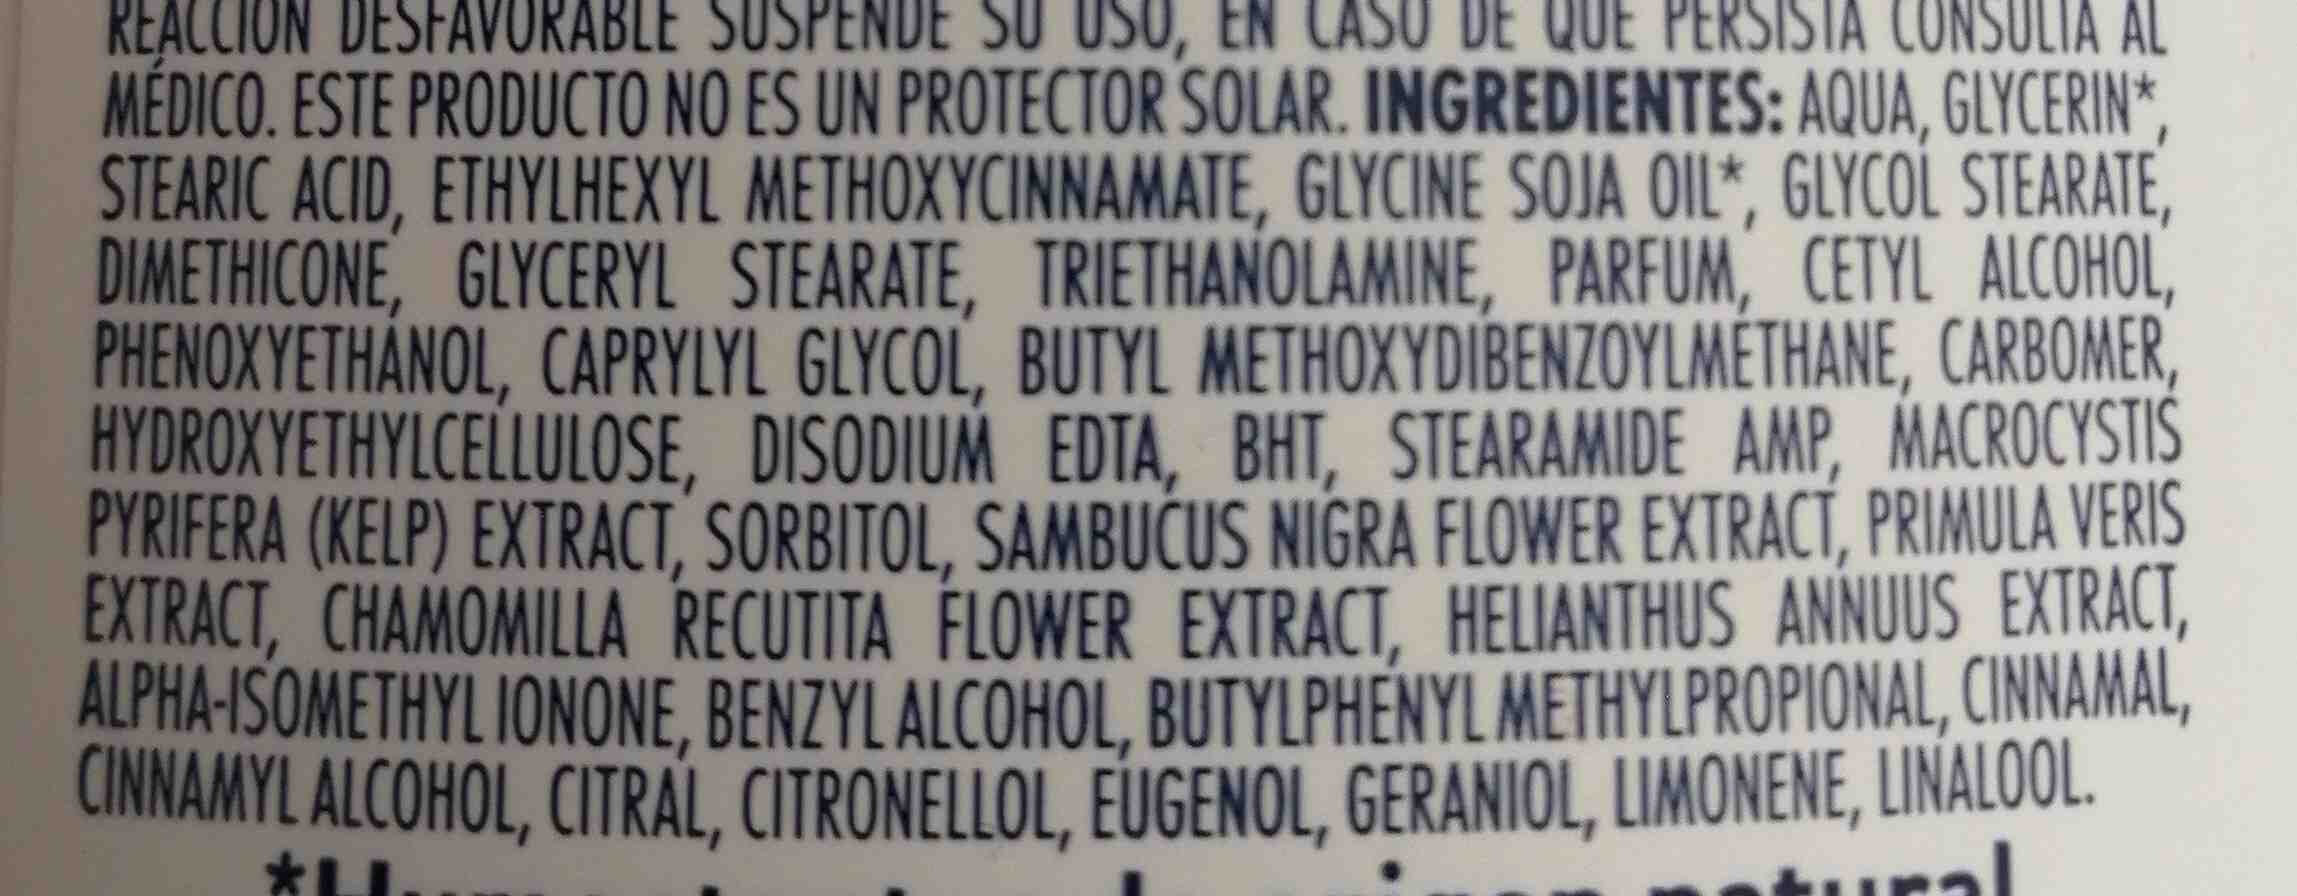 Crema ST. Ives - Ingredients - en